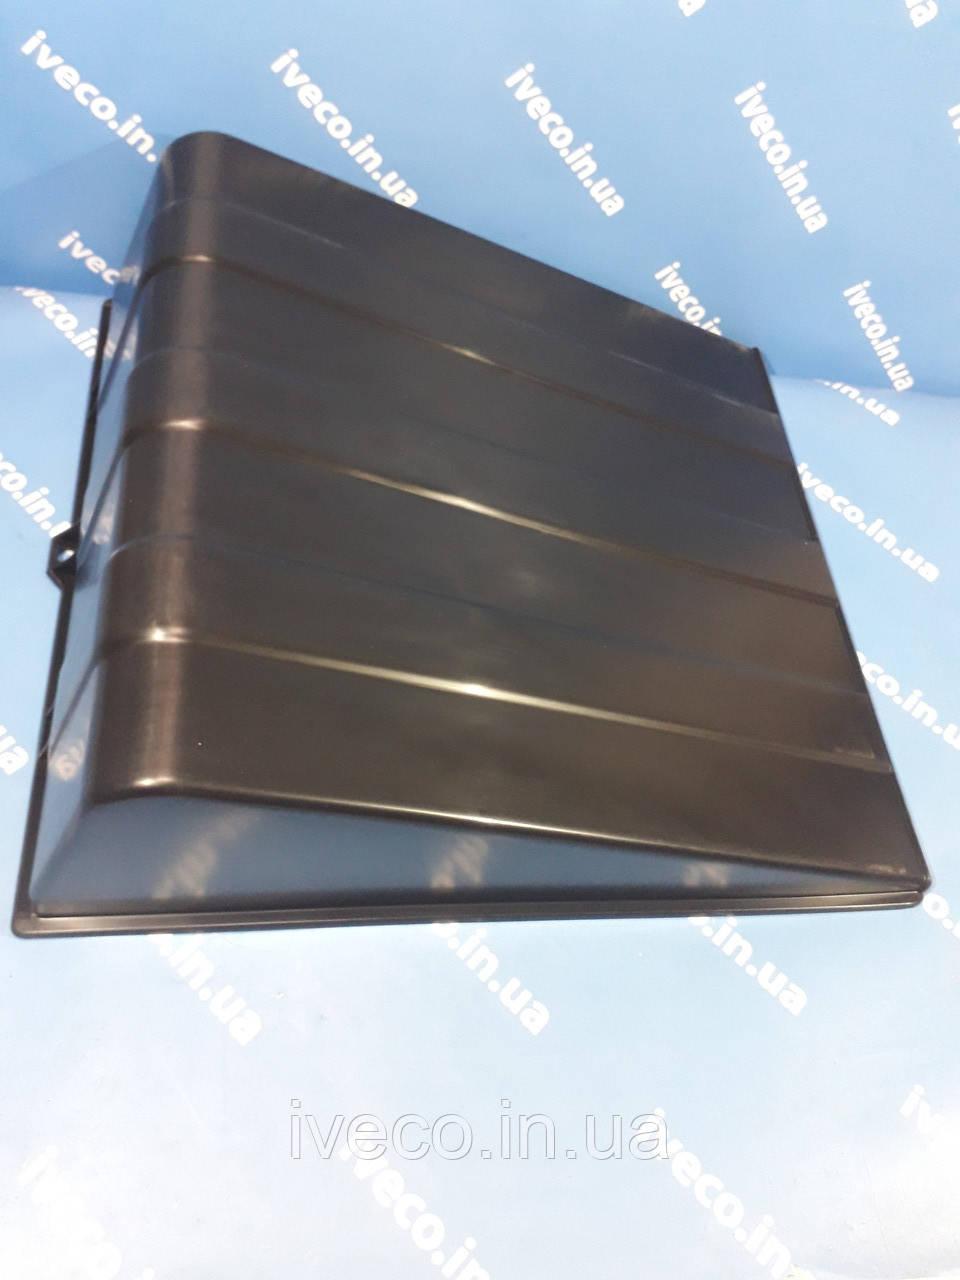 Крышка аккумулятора MAN TGL TGA TGX L2000 LE M 81.41860-0083 81418600083 крышка АКБ